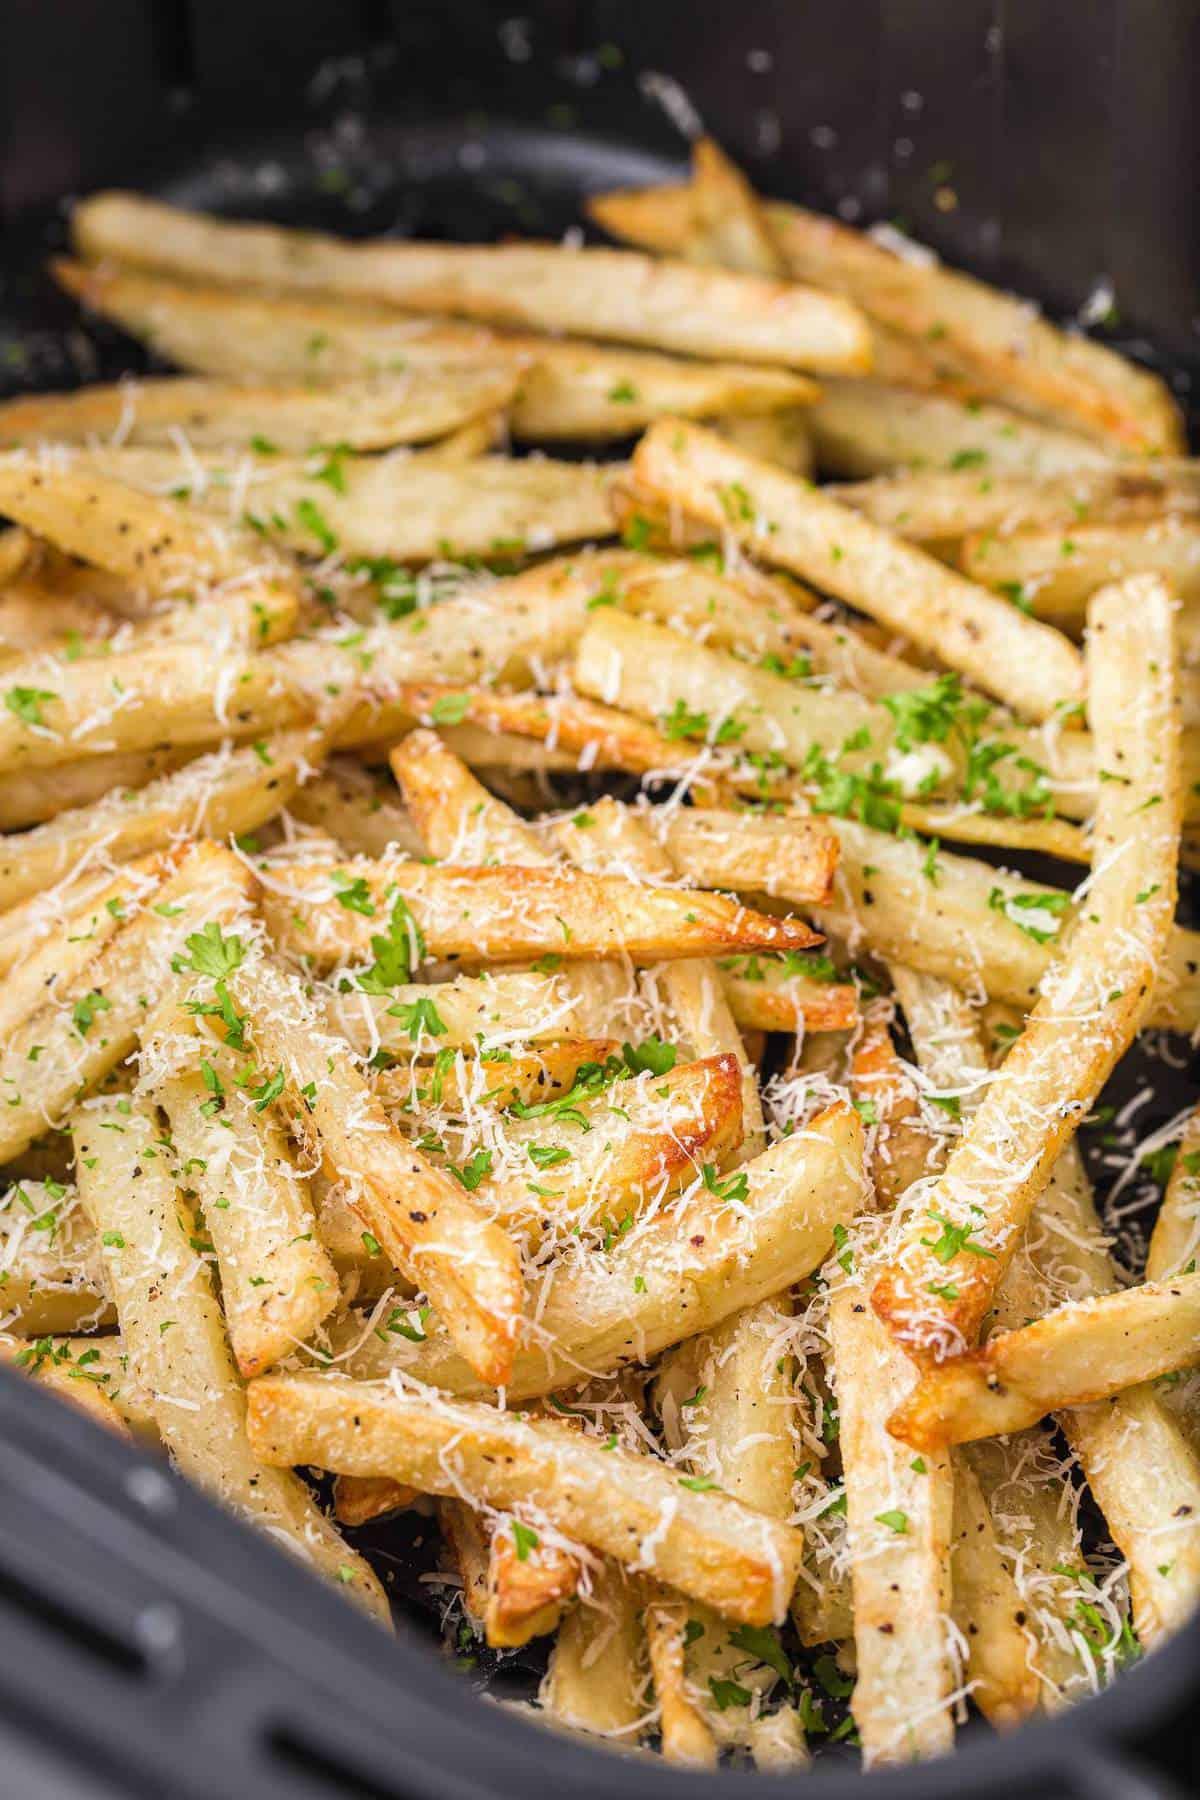 garlic parmesan fries inside the air fryer